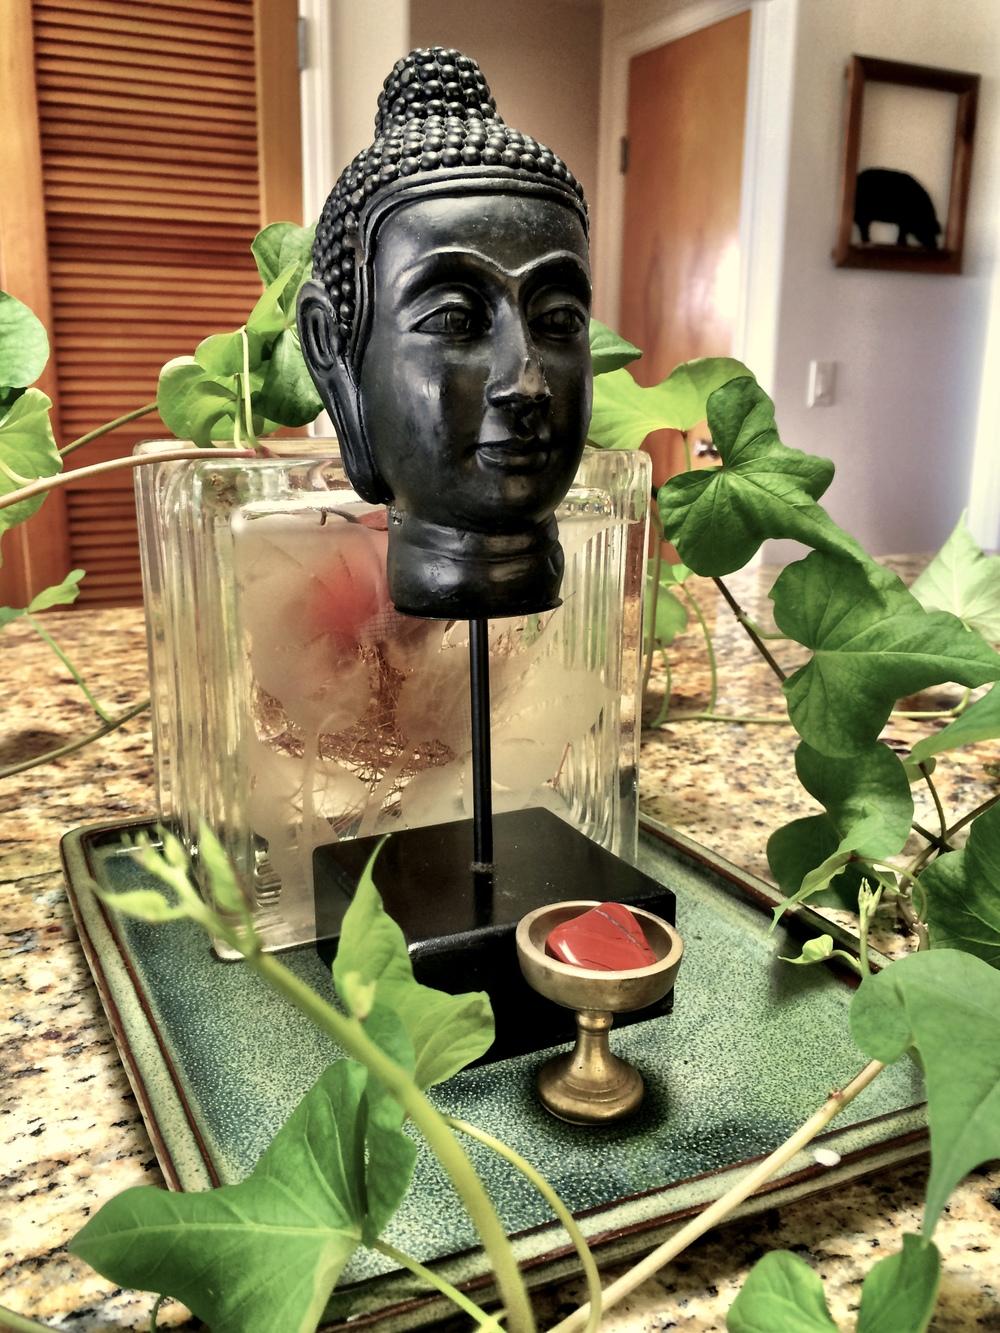 sweet_buddha_ricecup.jpg